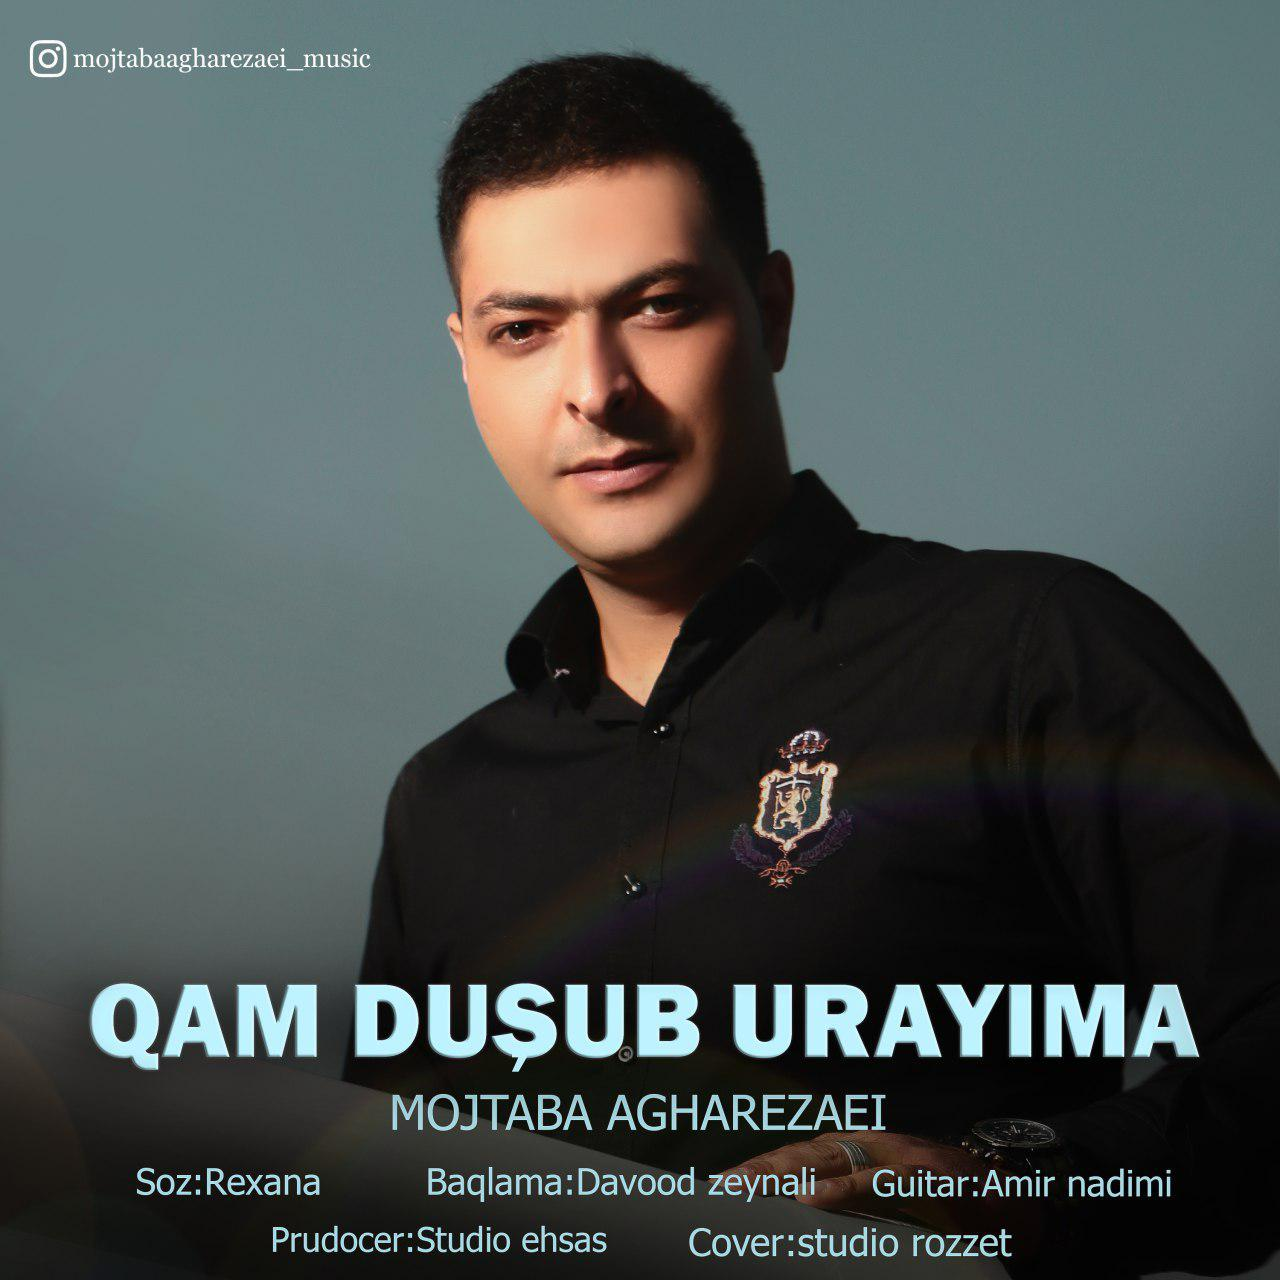 Mojtaba Agharezaei - Qam Dusub Urayima